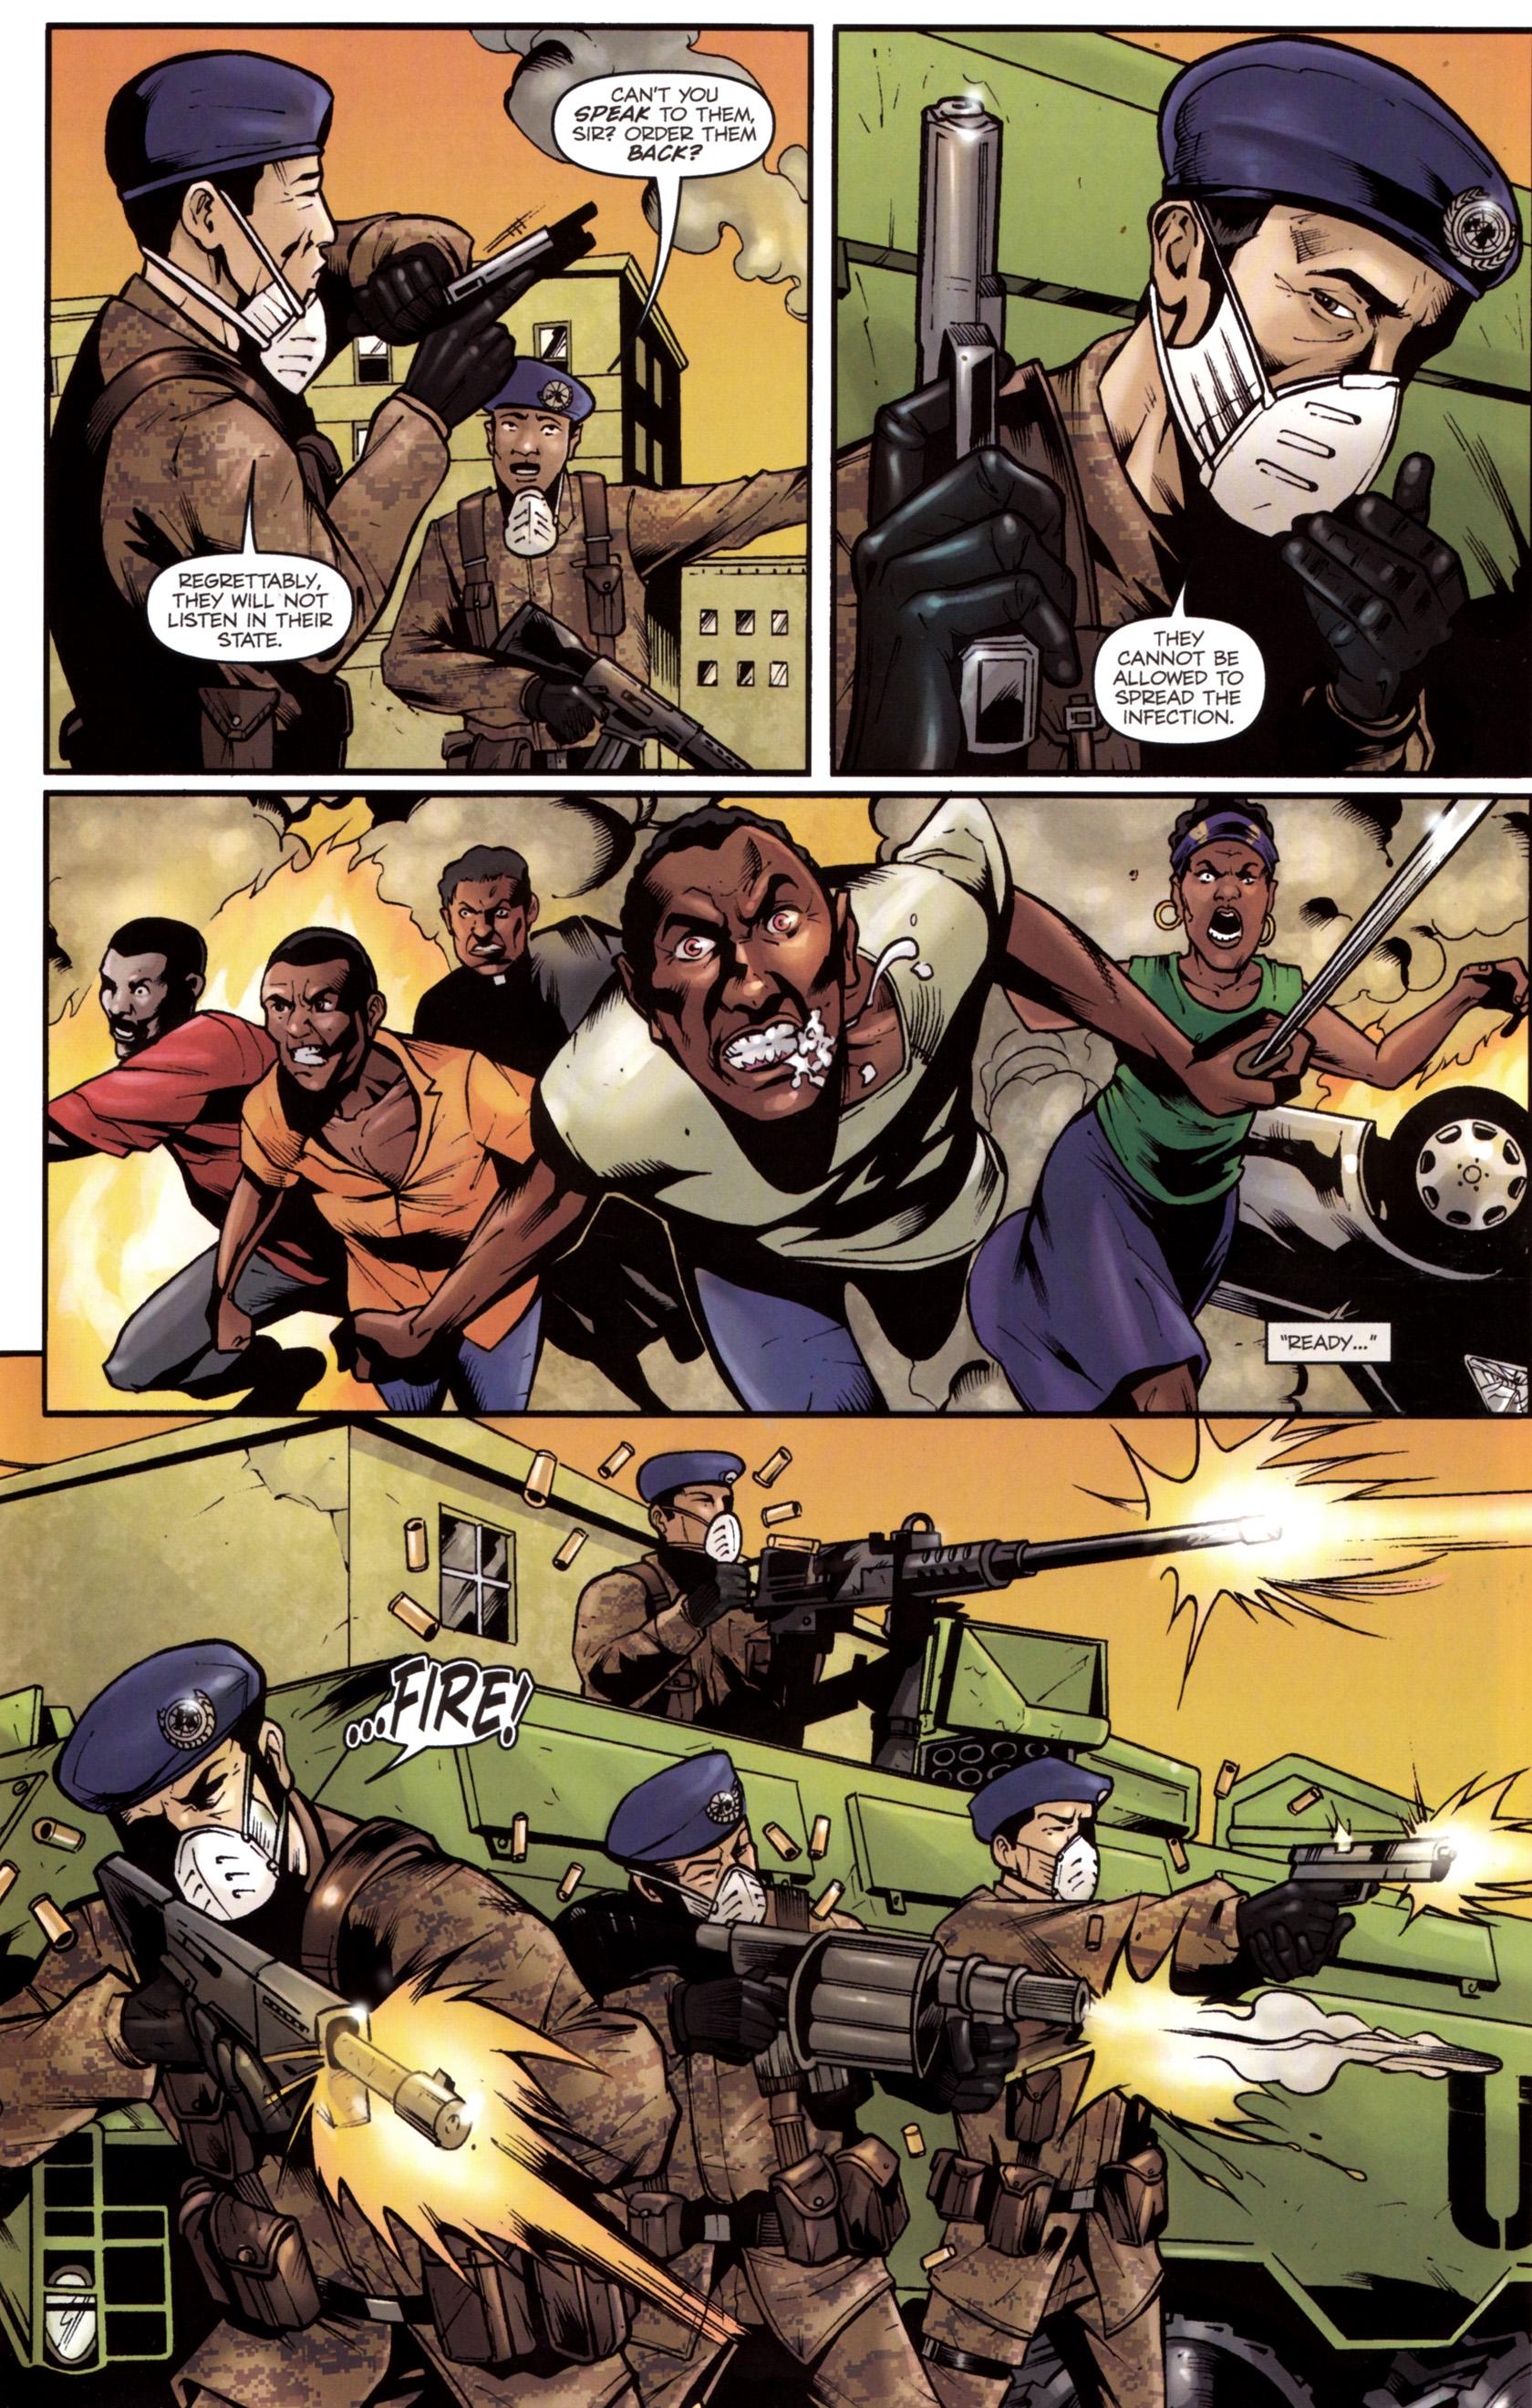 Read online G.I. Joe: Snake Eyes comic -  Issue #5 - 10